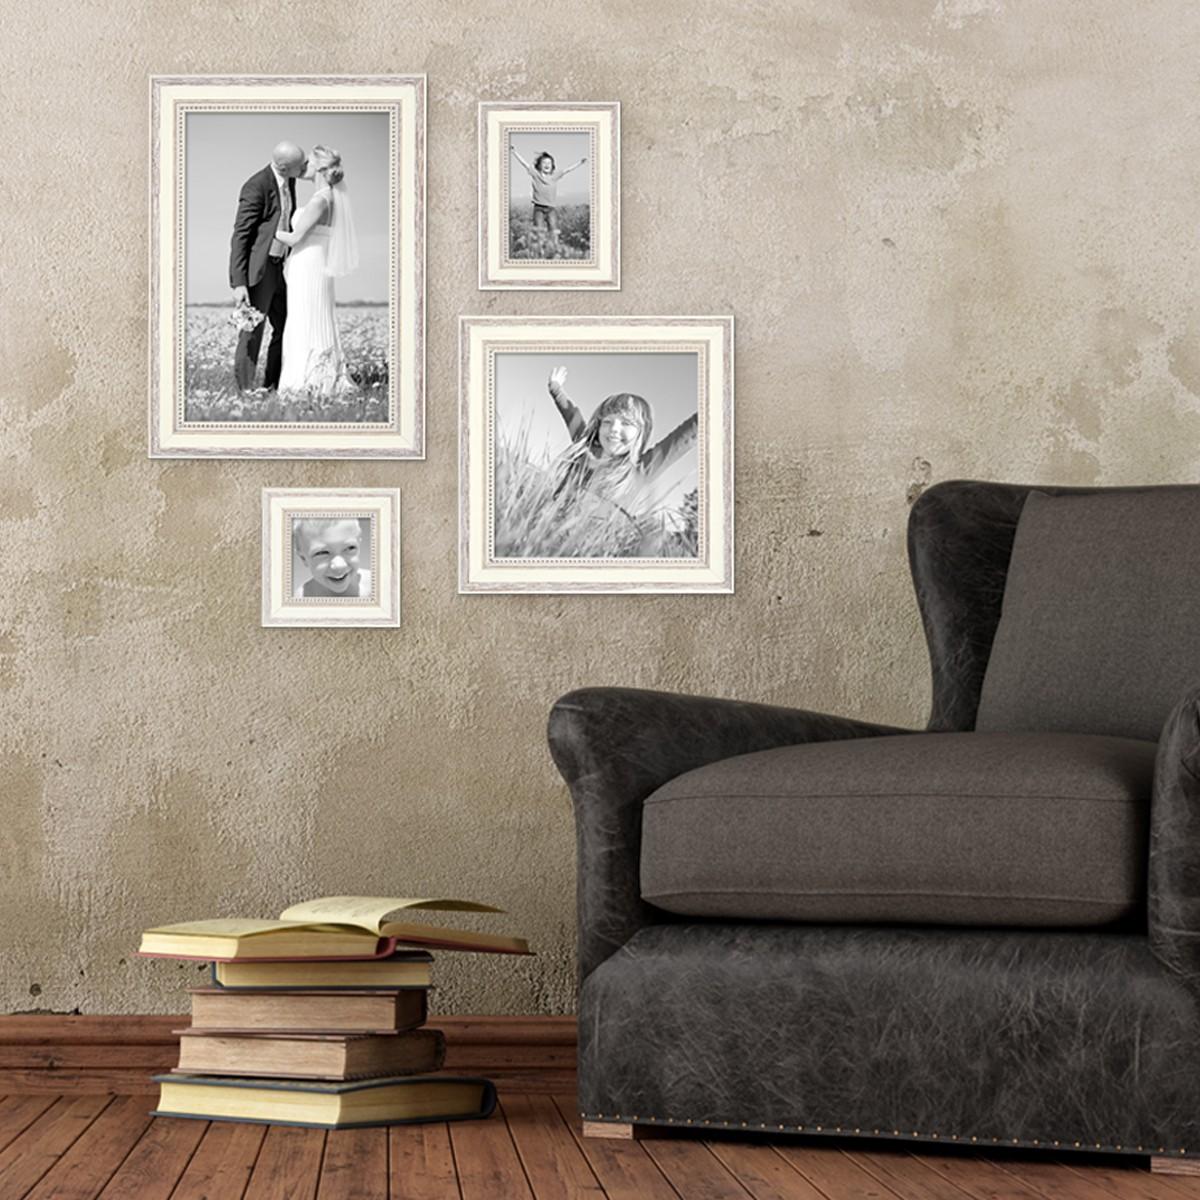 bilderrahmen shabby chic landhaus stil weiss 4er set. Black Bedroom Furniture Sets. Home Design Ideas